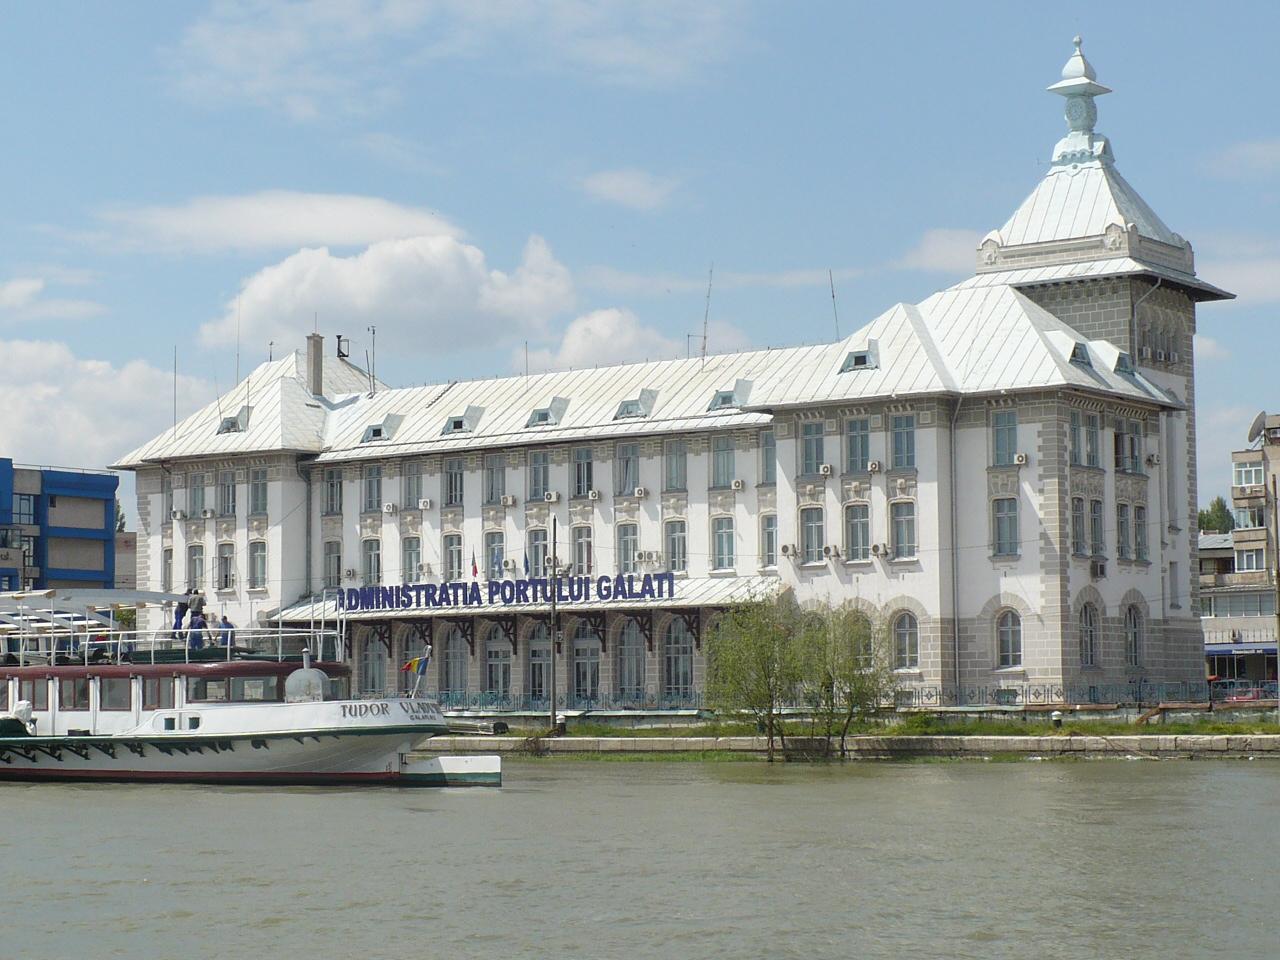 Administratia Portului Galati